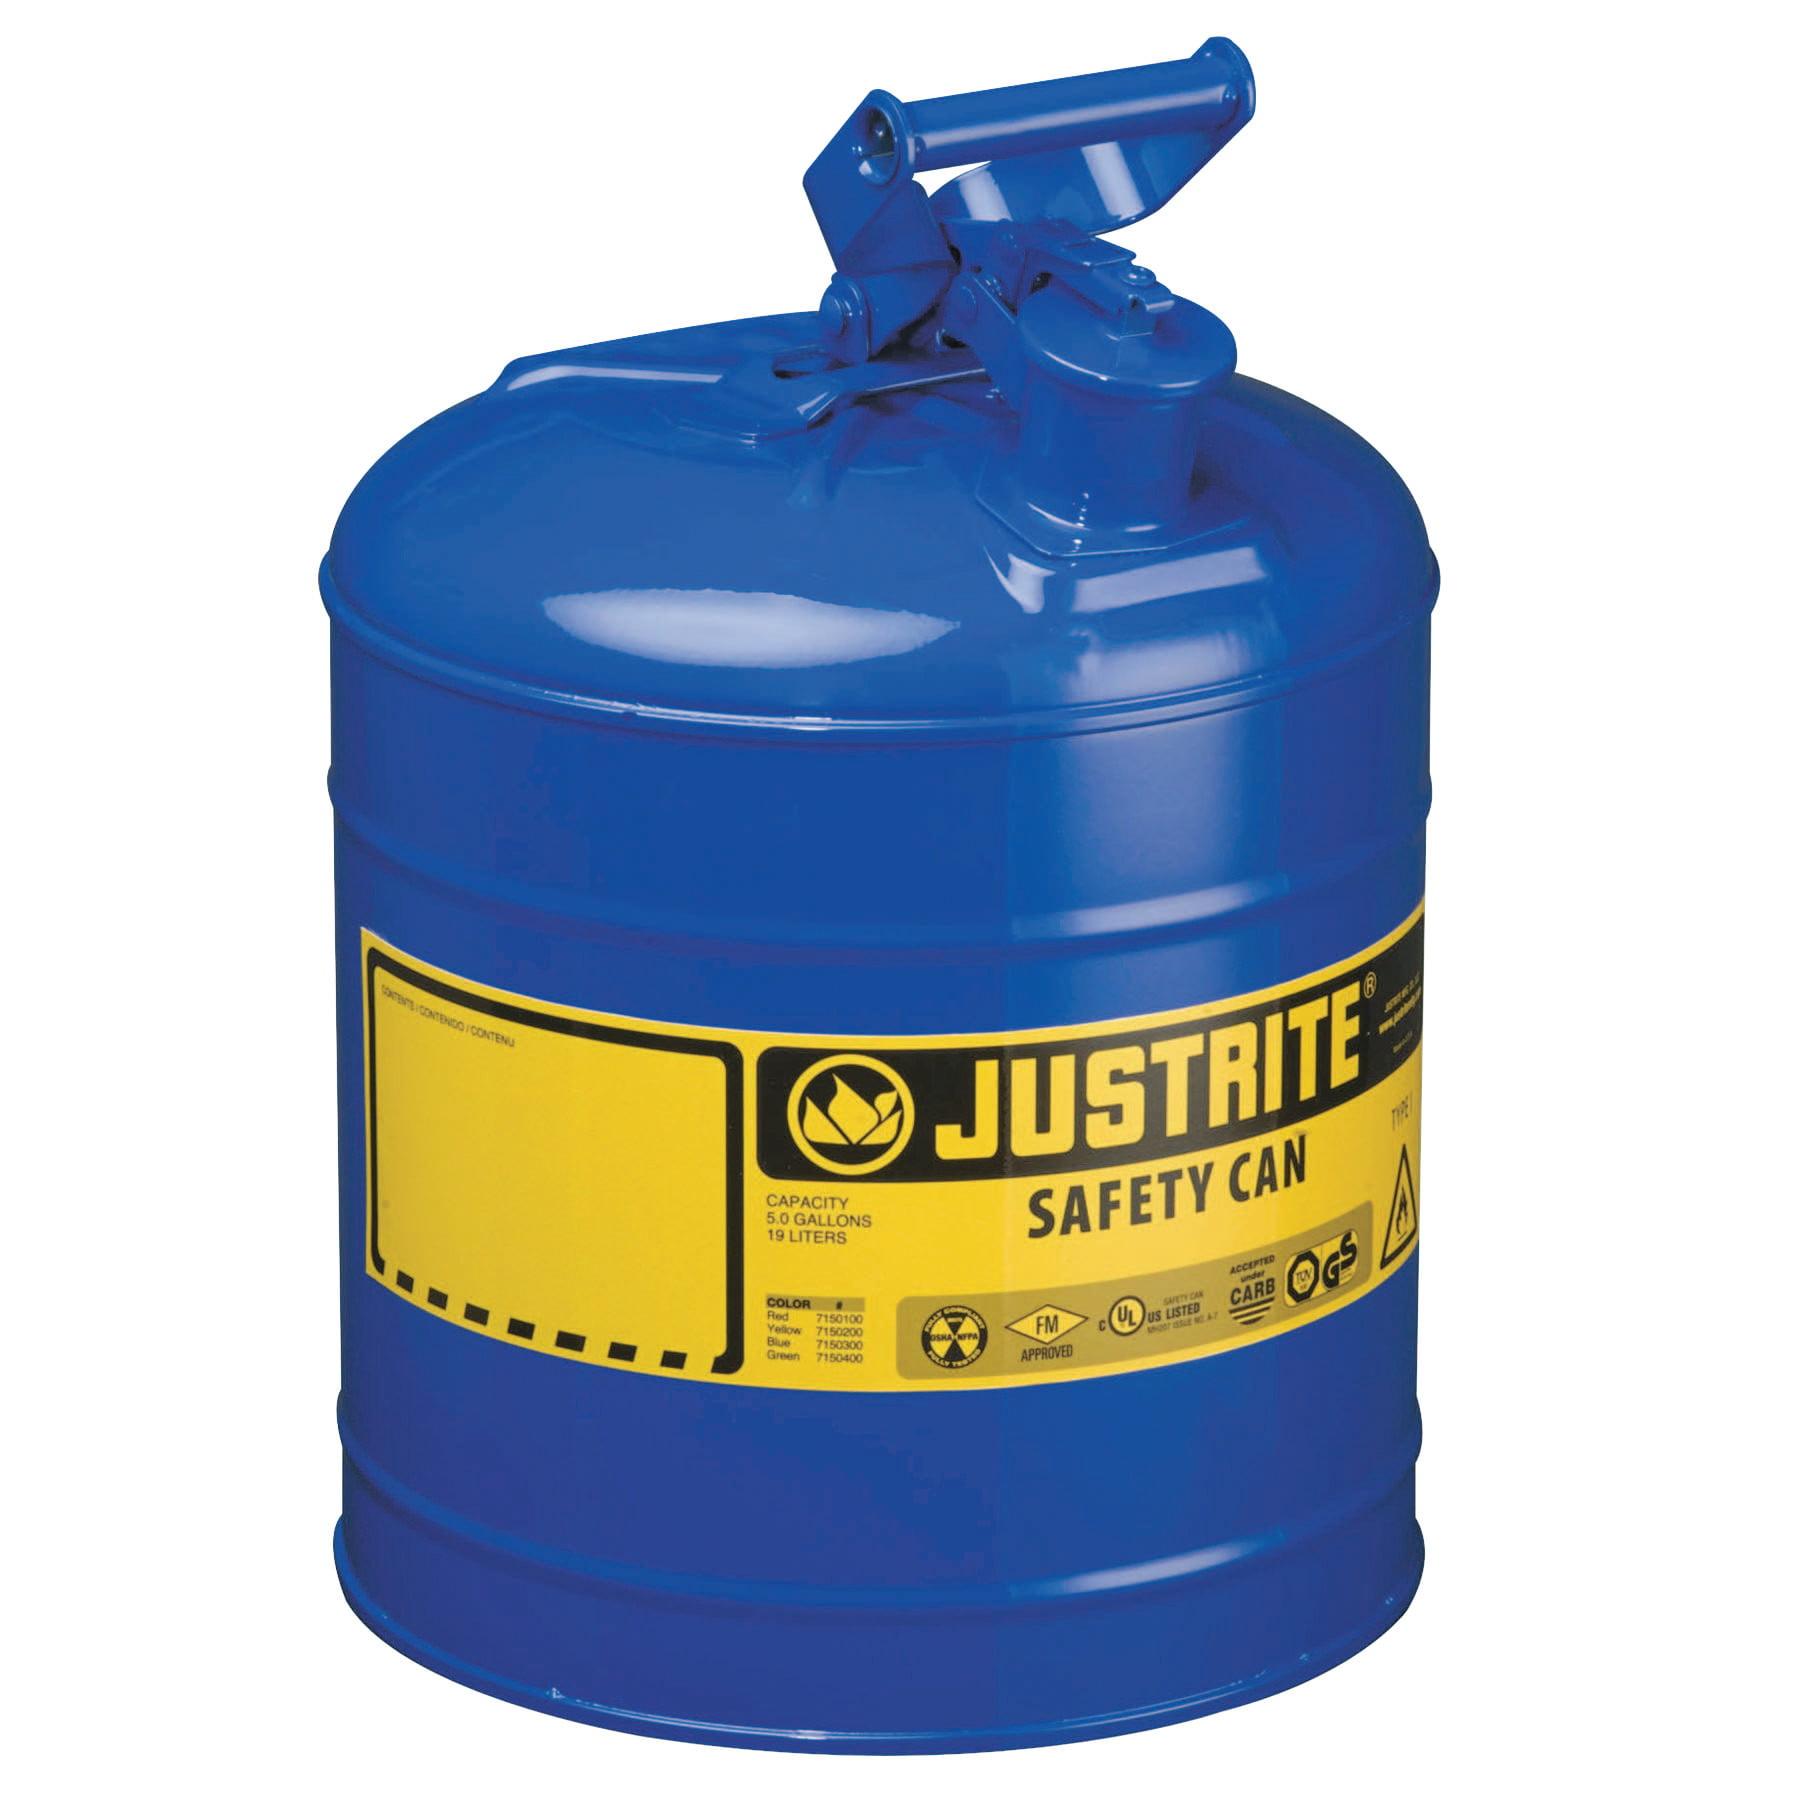 Justrite Type I Safety Cans, Kerosene, 5 gal, Blue